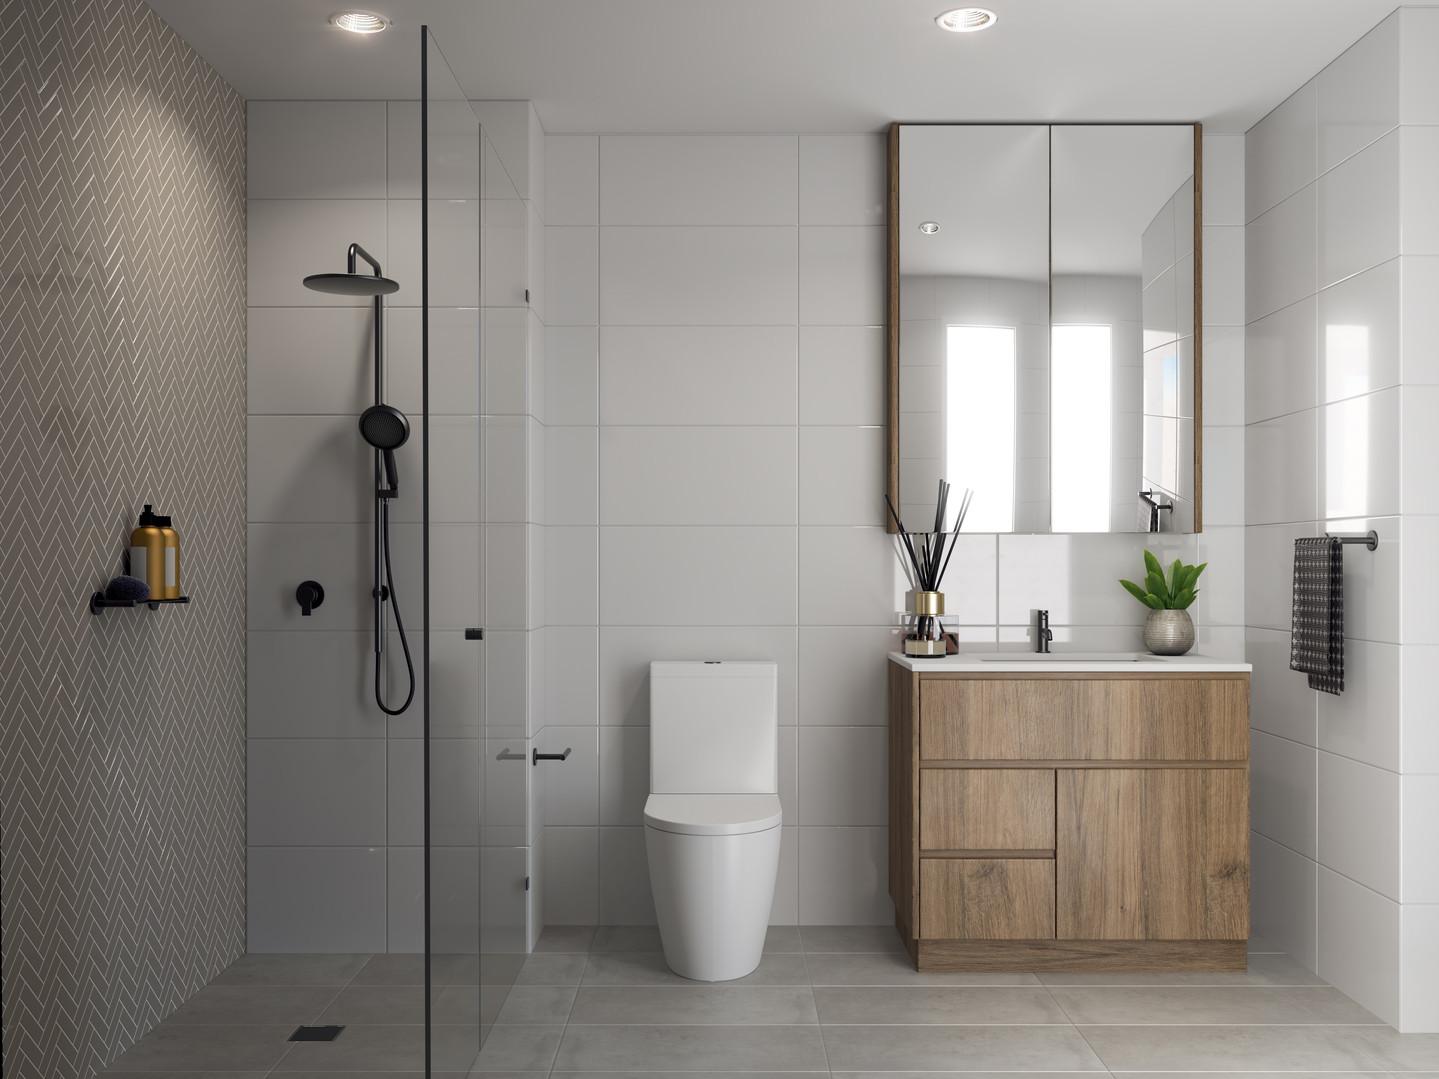 Bathroom-Cool Theme-Low-res.jpg